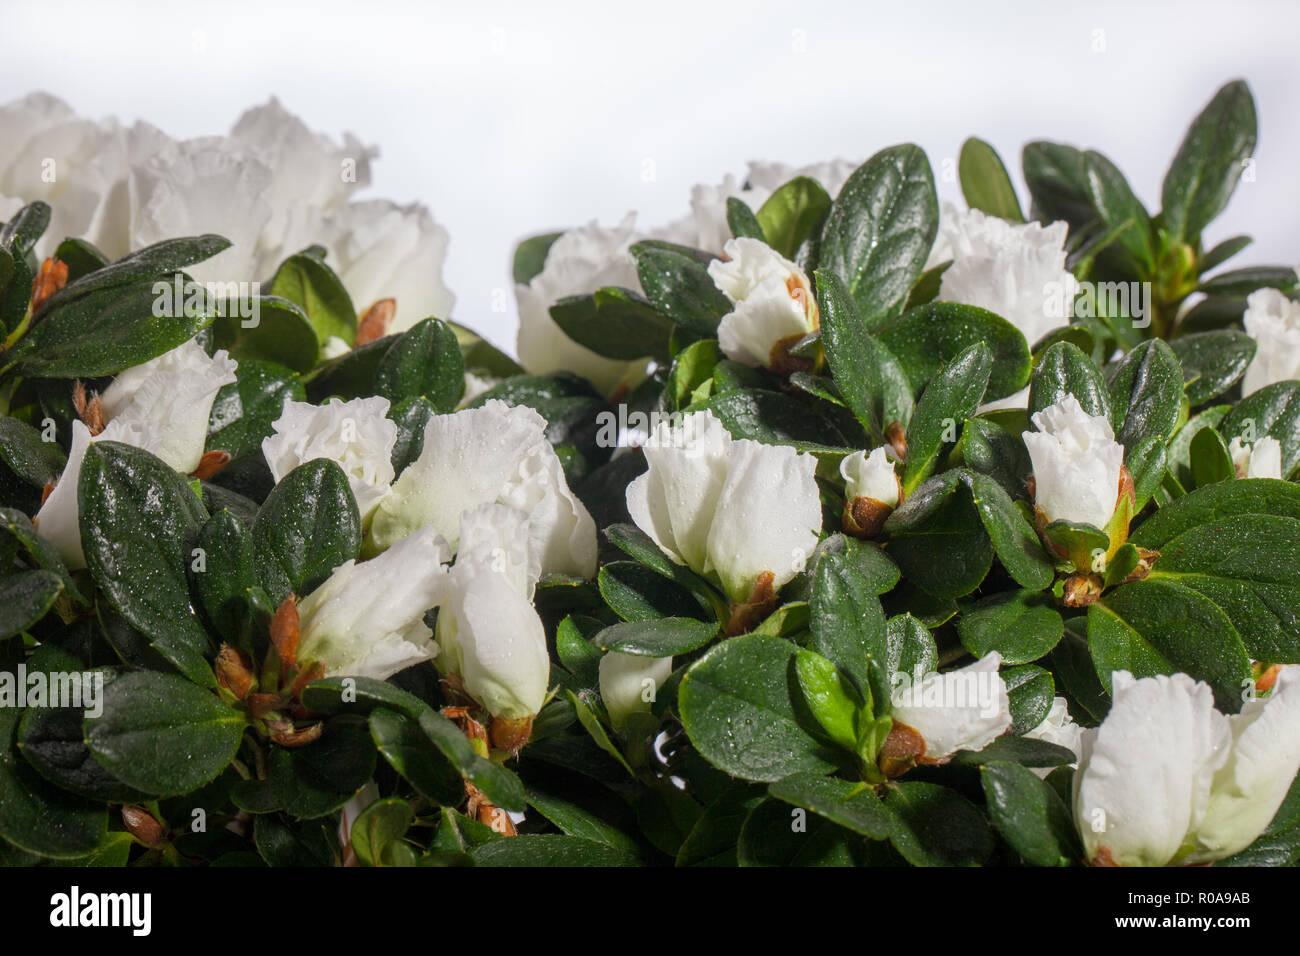 Azalea, Rhododendron Simsii-gruppen (Rhododendron simsii) - Stock Image